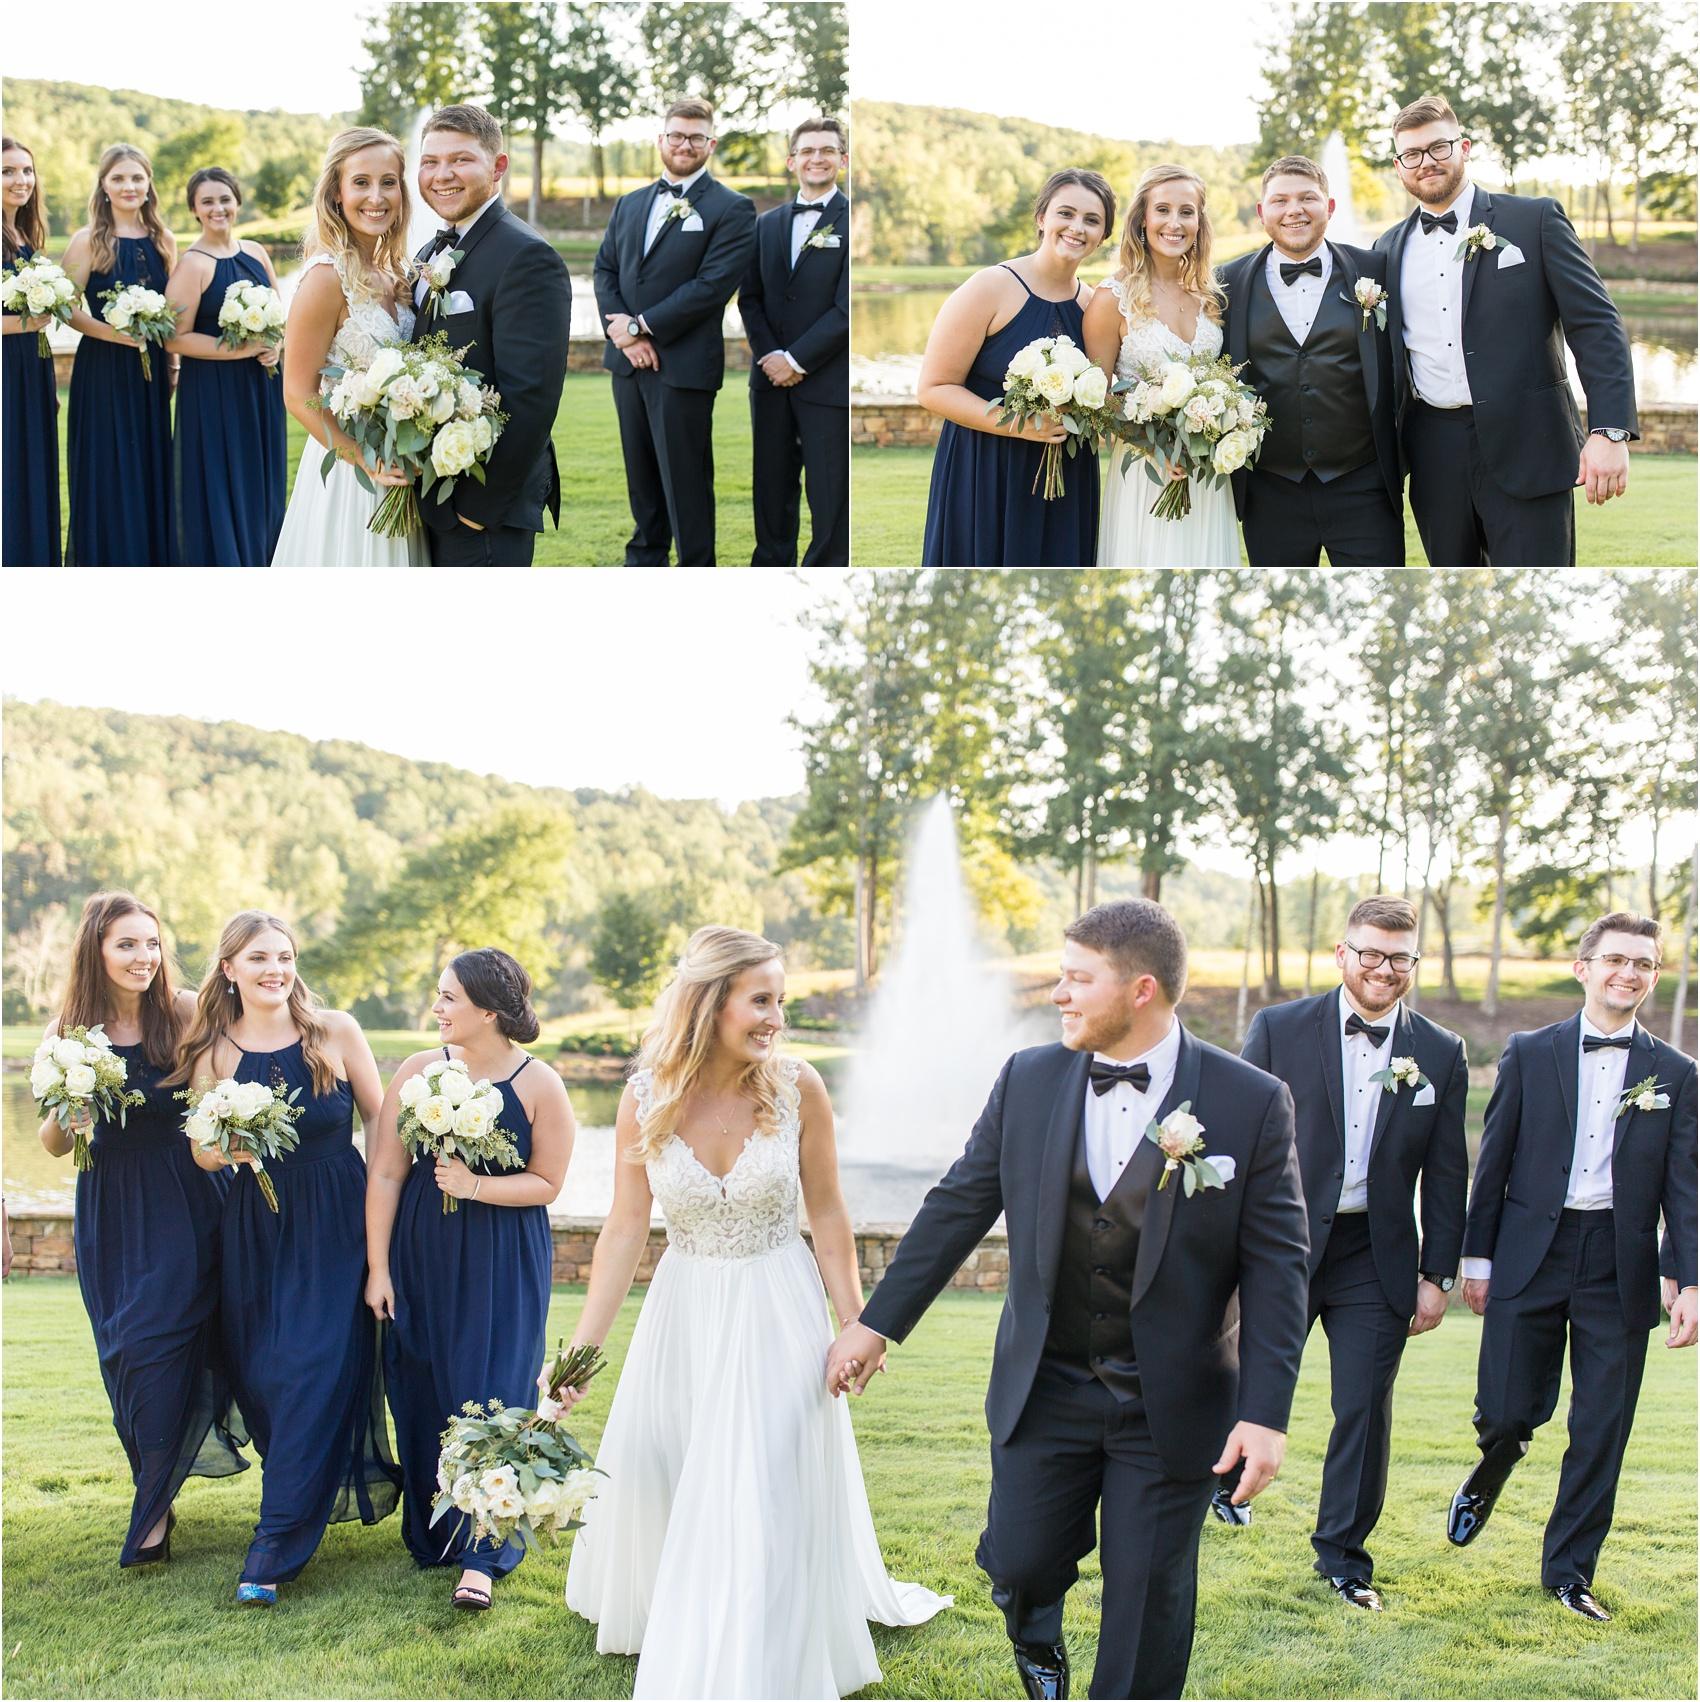 Savannah Eve Photography- Jurek-Woodworth Wedding- Sneak Peek-56.jpg